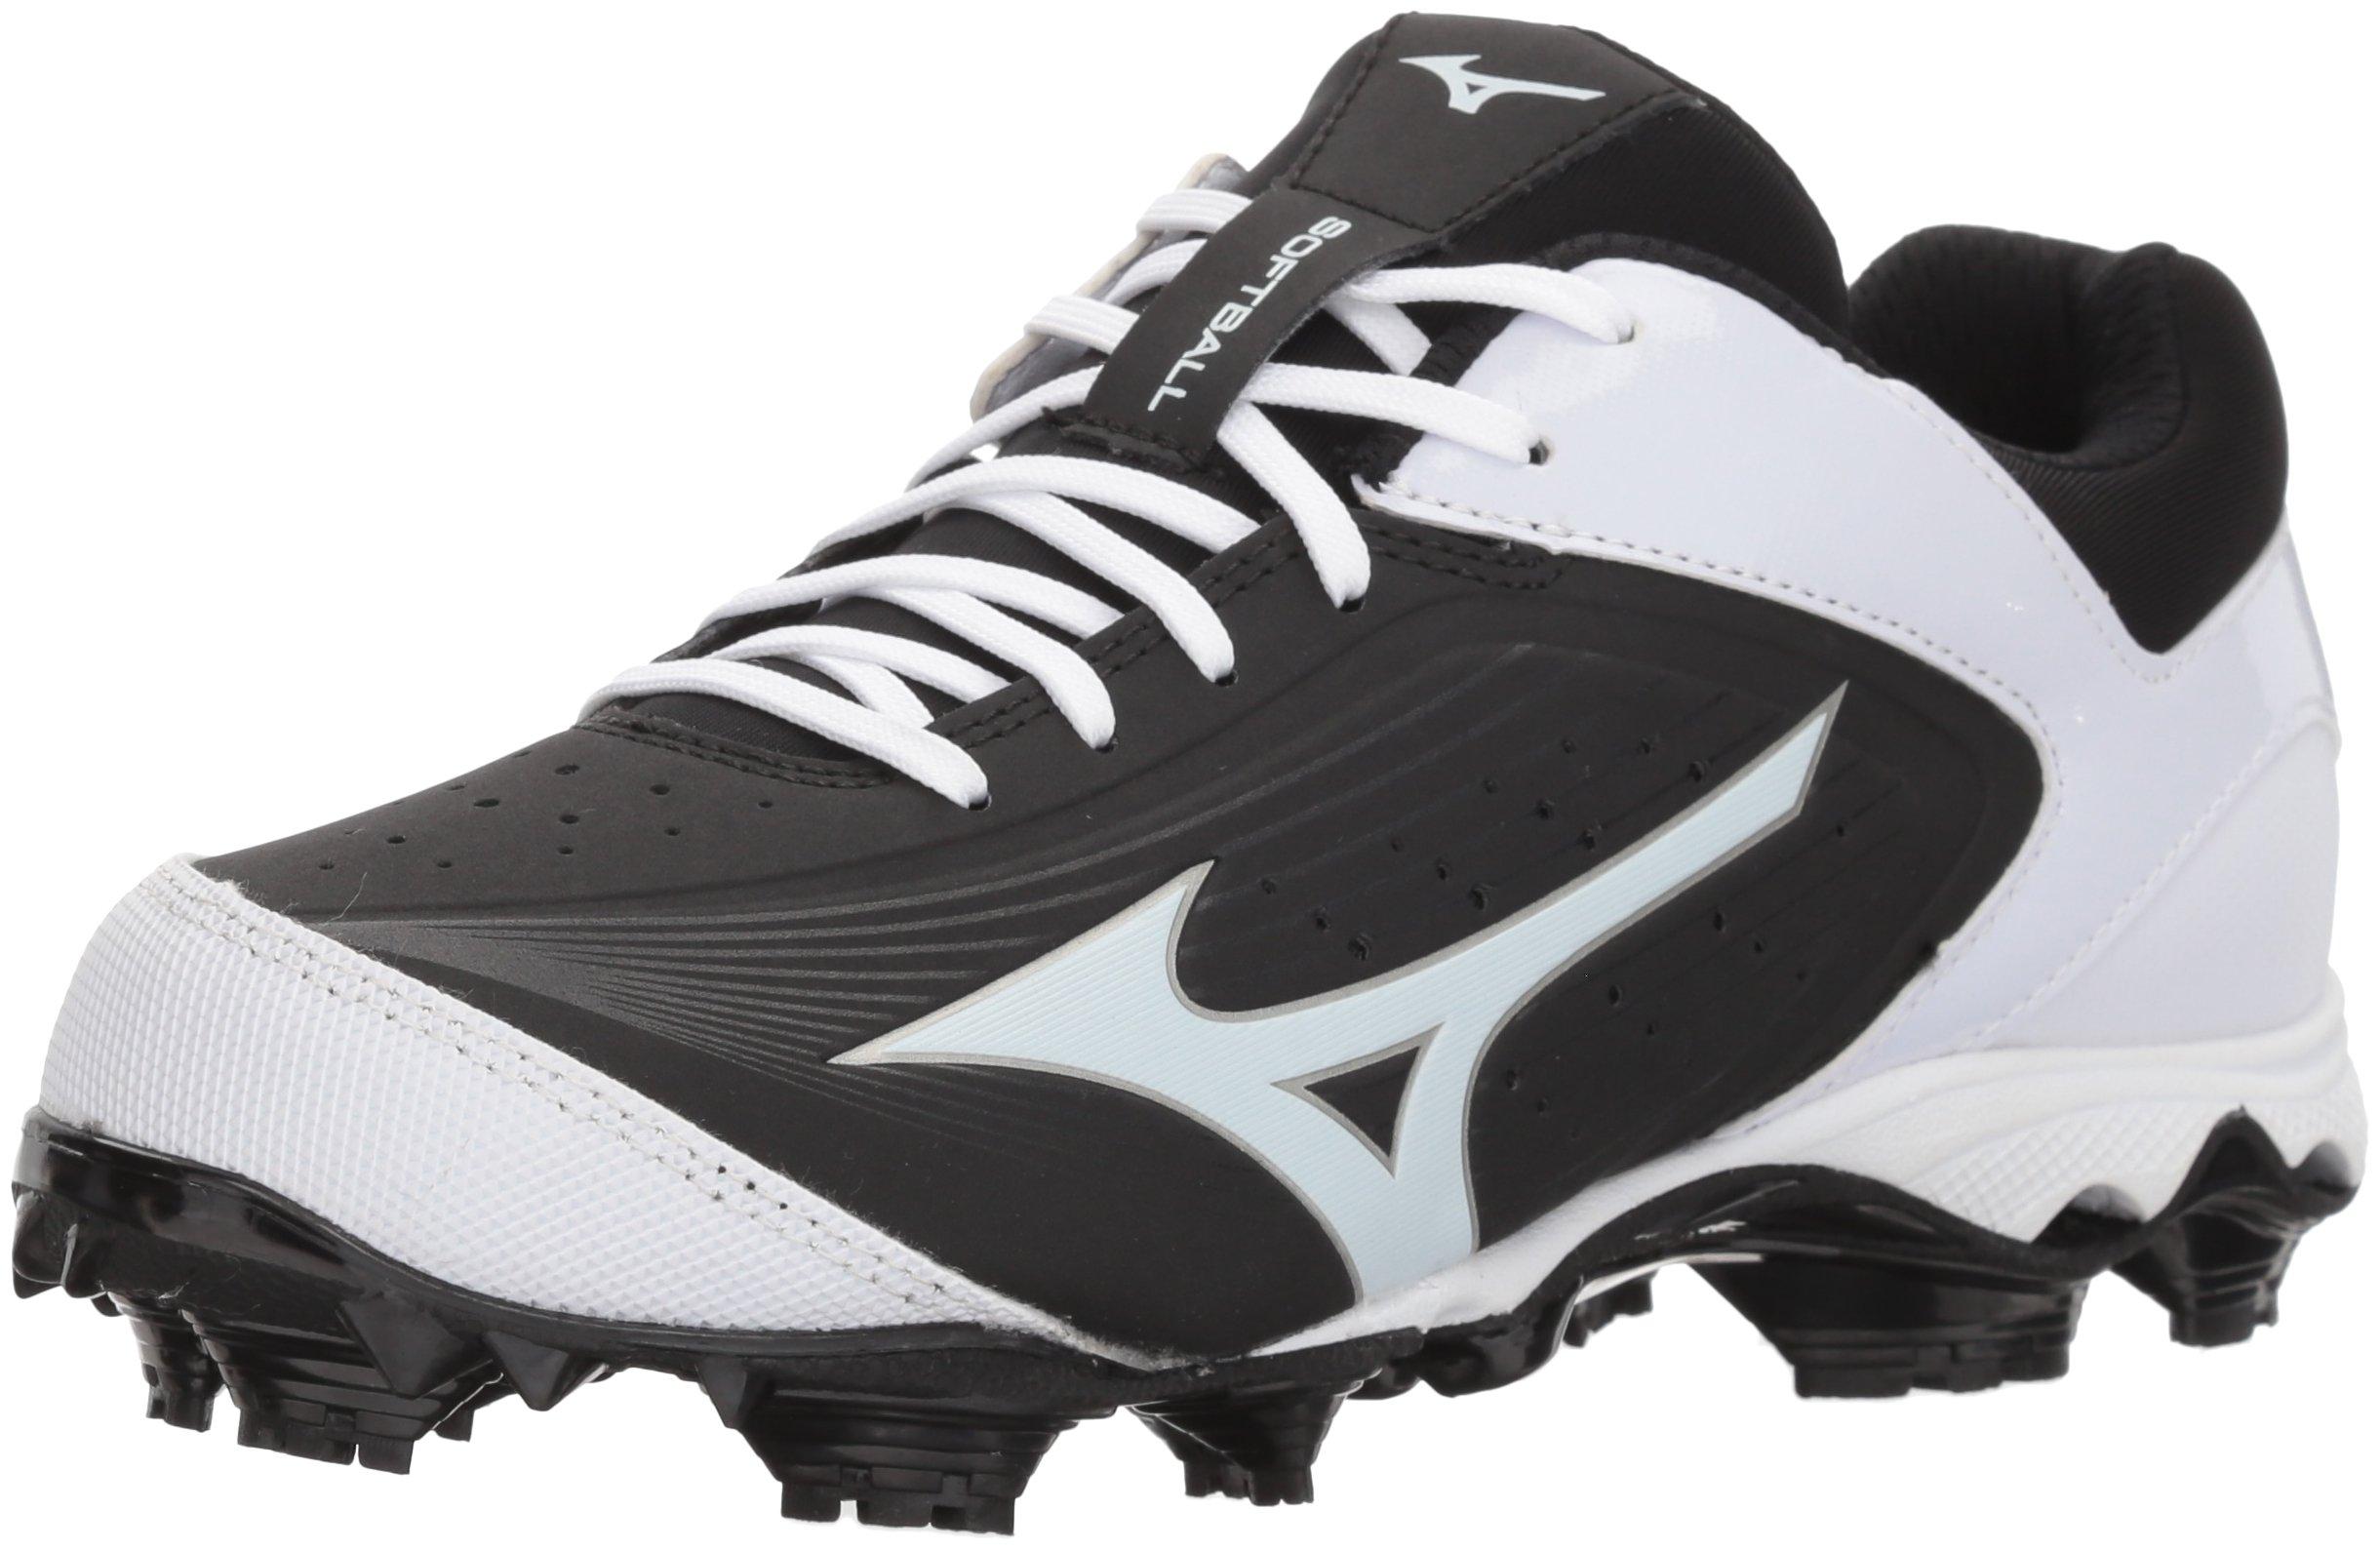 Mizuno Women's 9-Spike Advanced Finch Elite 3 Fastpitch Cleat Softball Shoe, Black/White, 10.5 B US by Mizuno